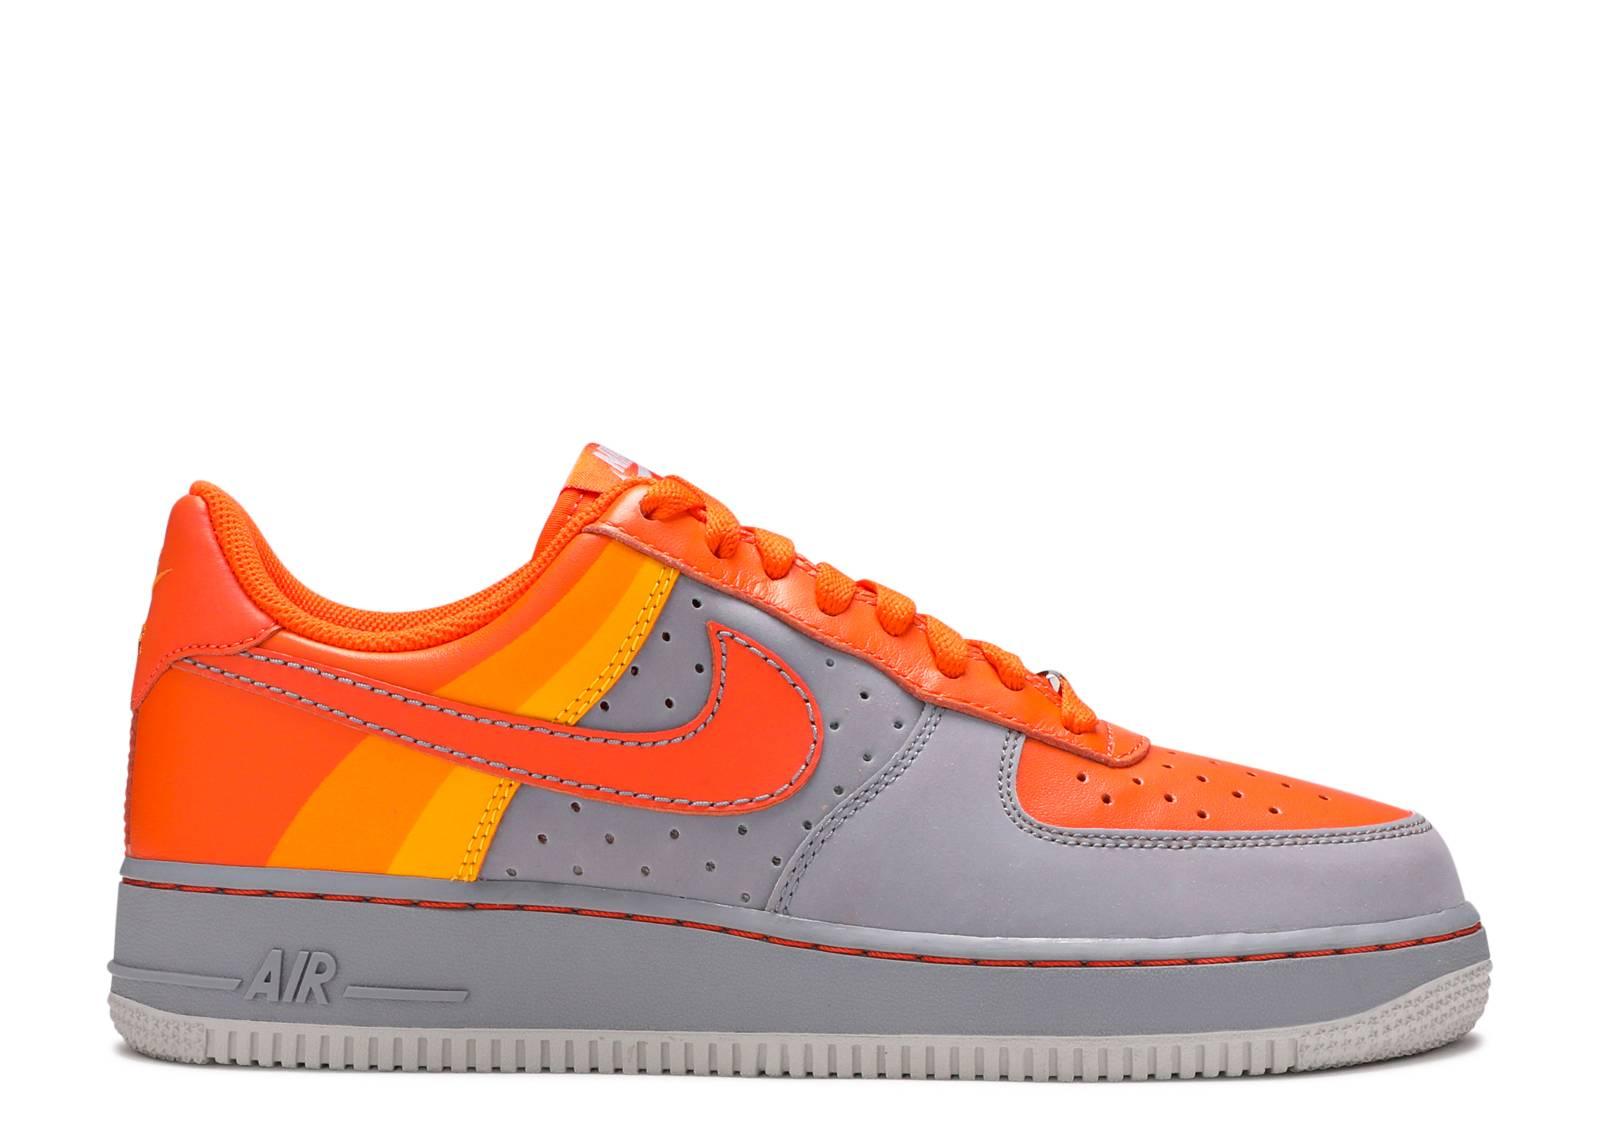 All Orange Nike Shoes